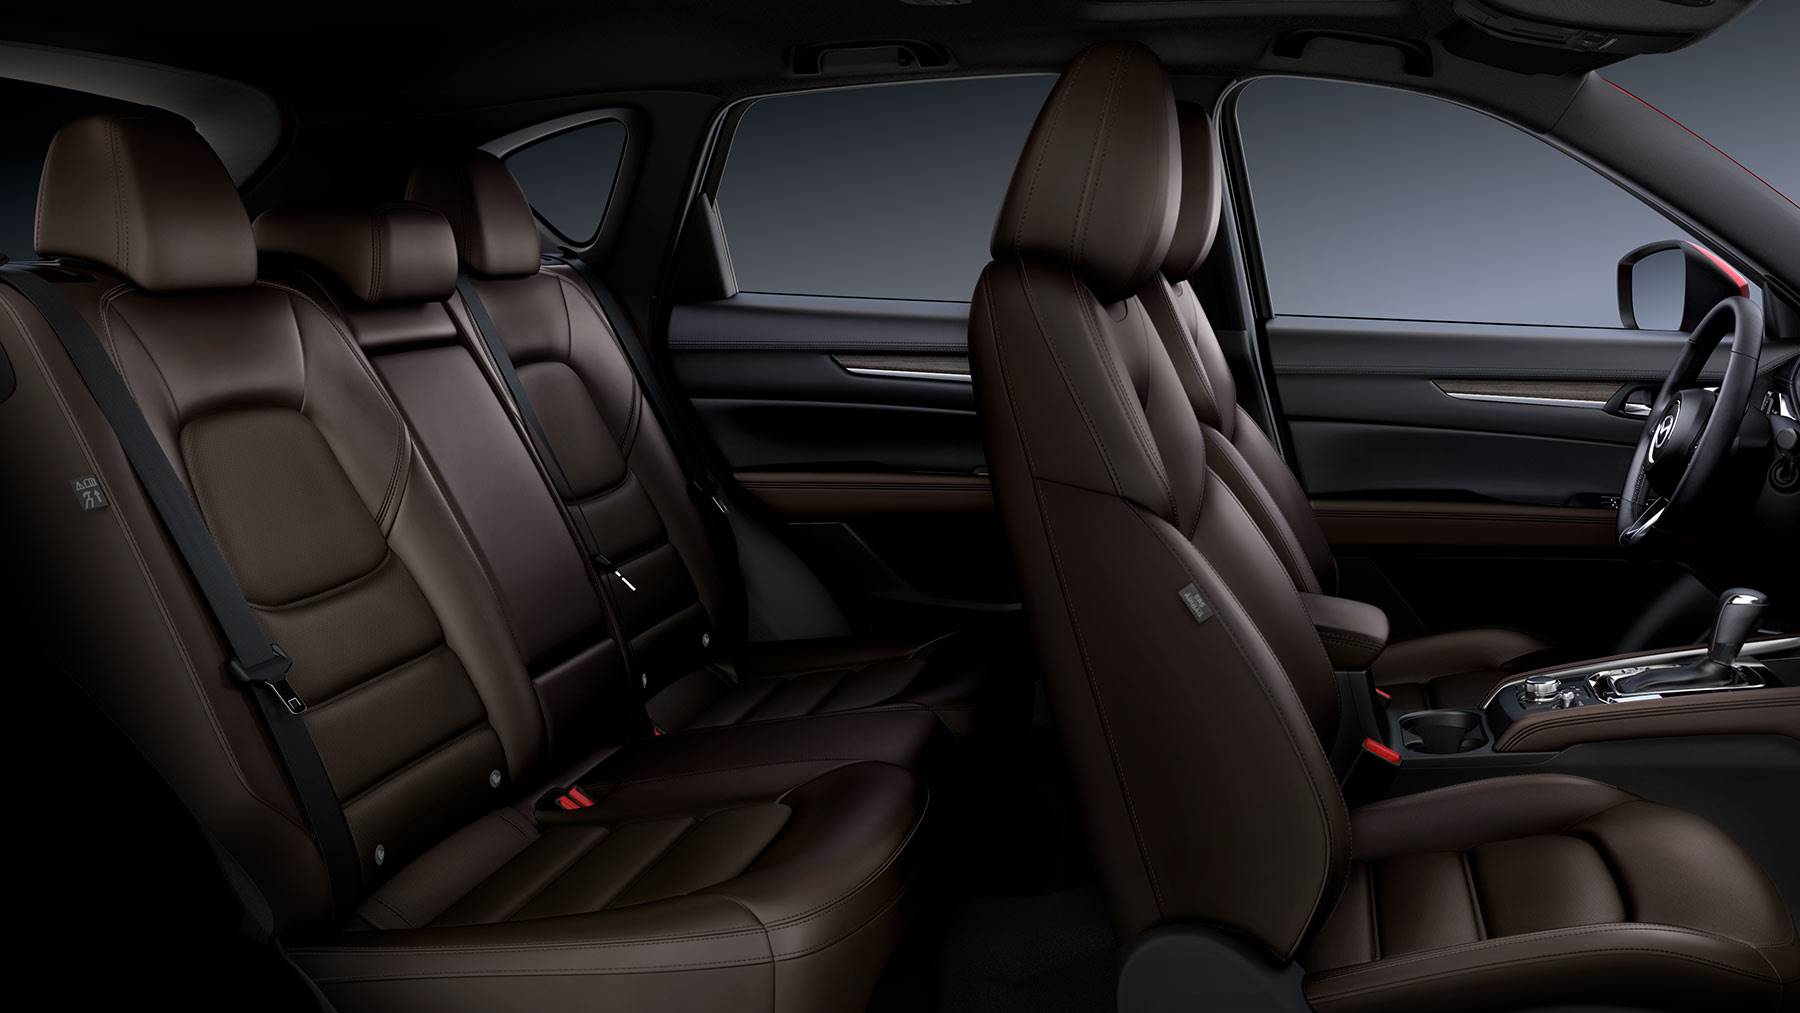 2019 Mazda CX-5 Seating